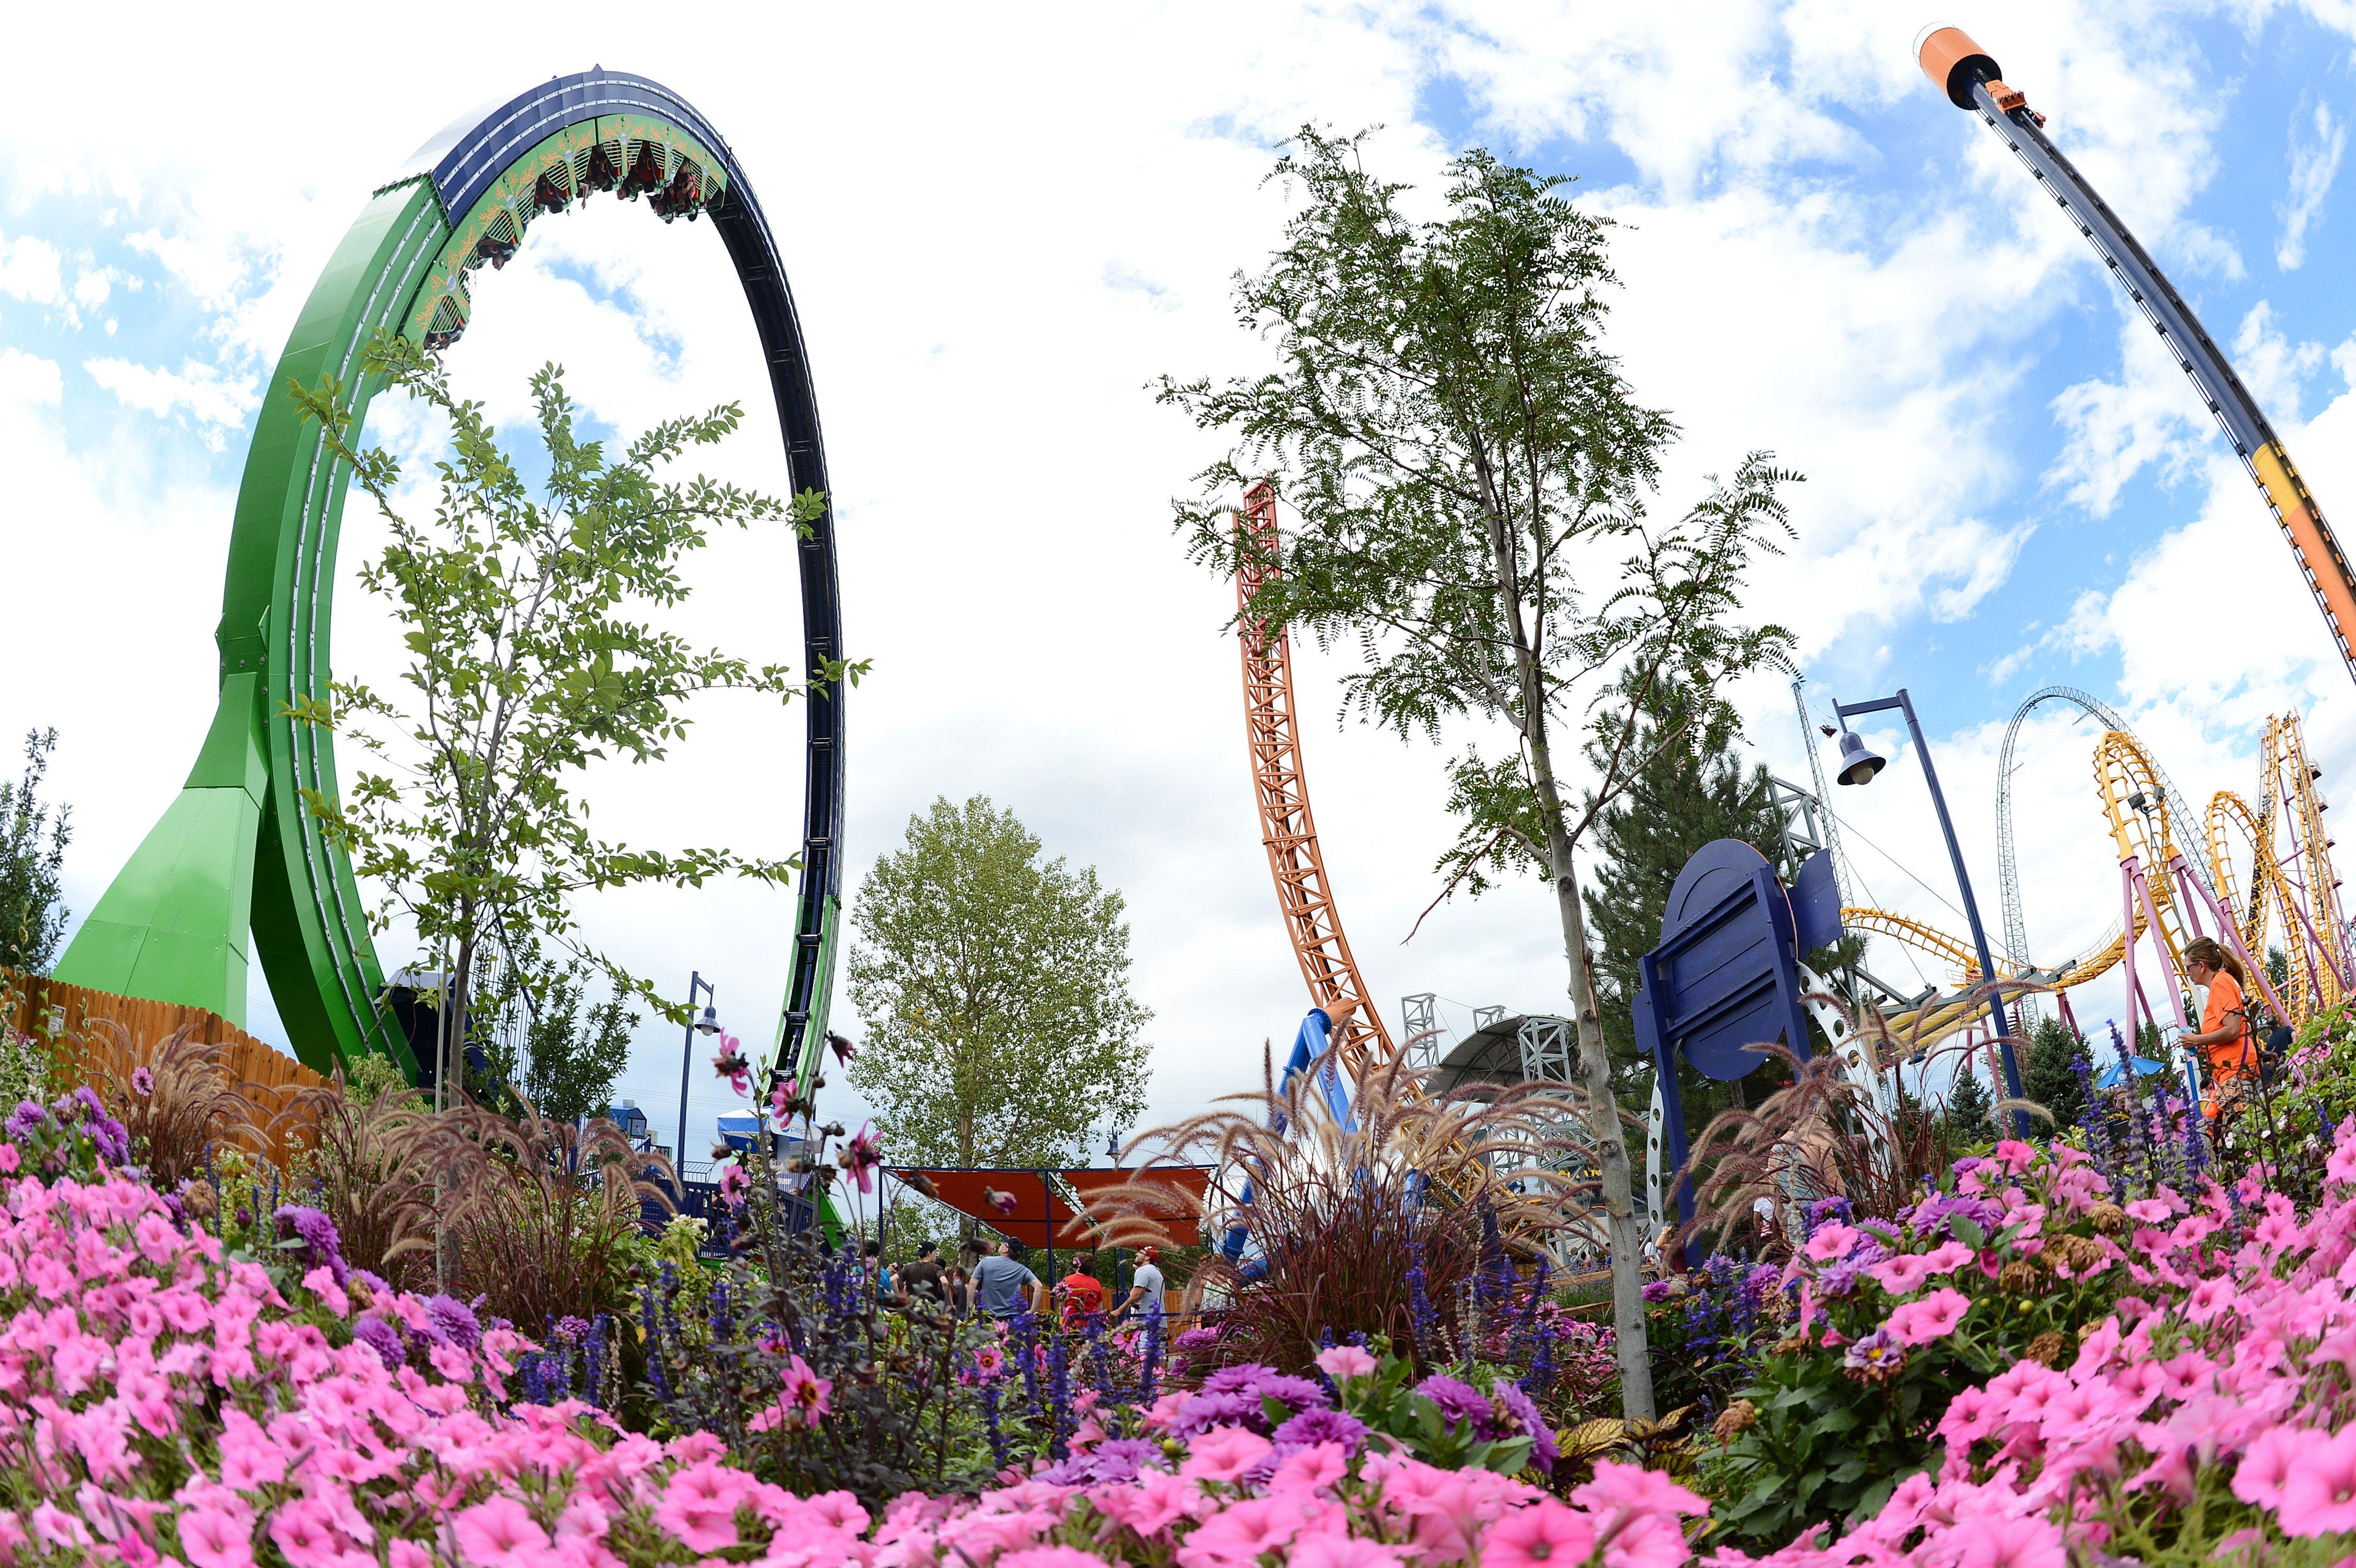 c6478052d27cc9545b5a8c0b4ce0898f - Elitch Gardens Theme And Water Park